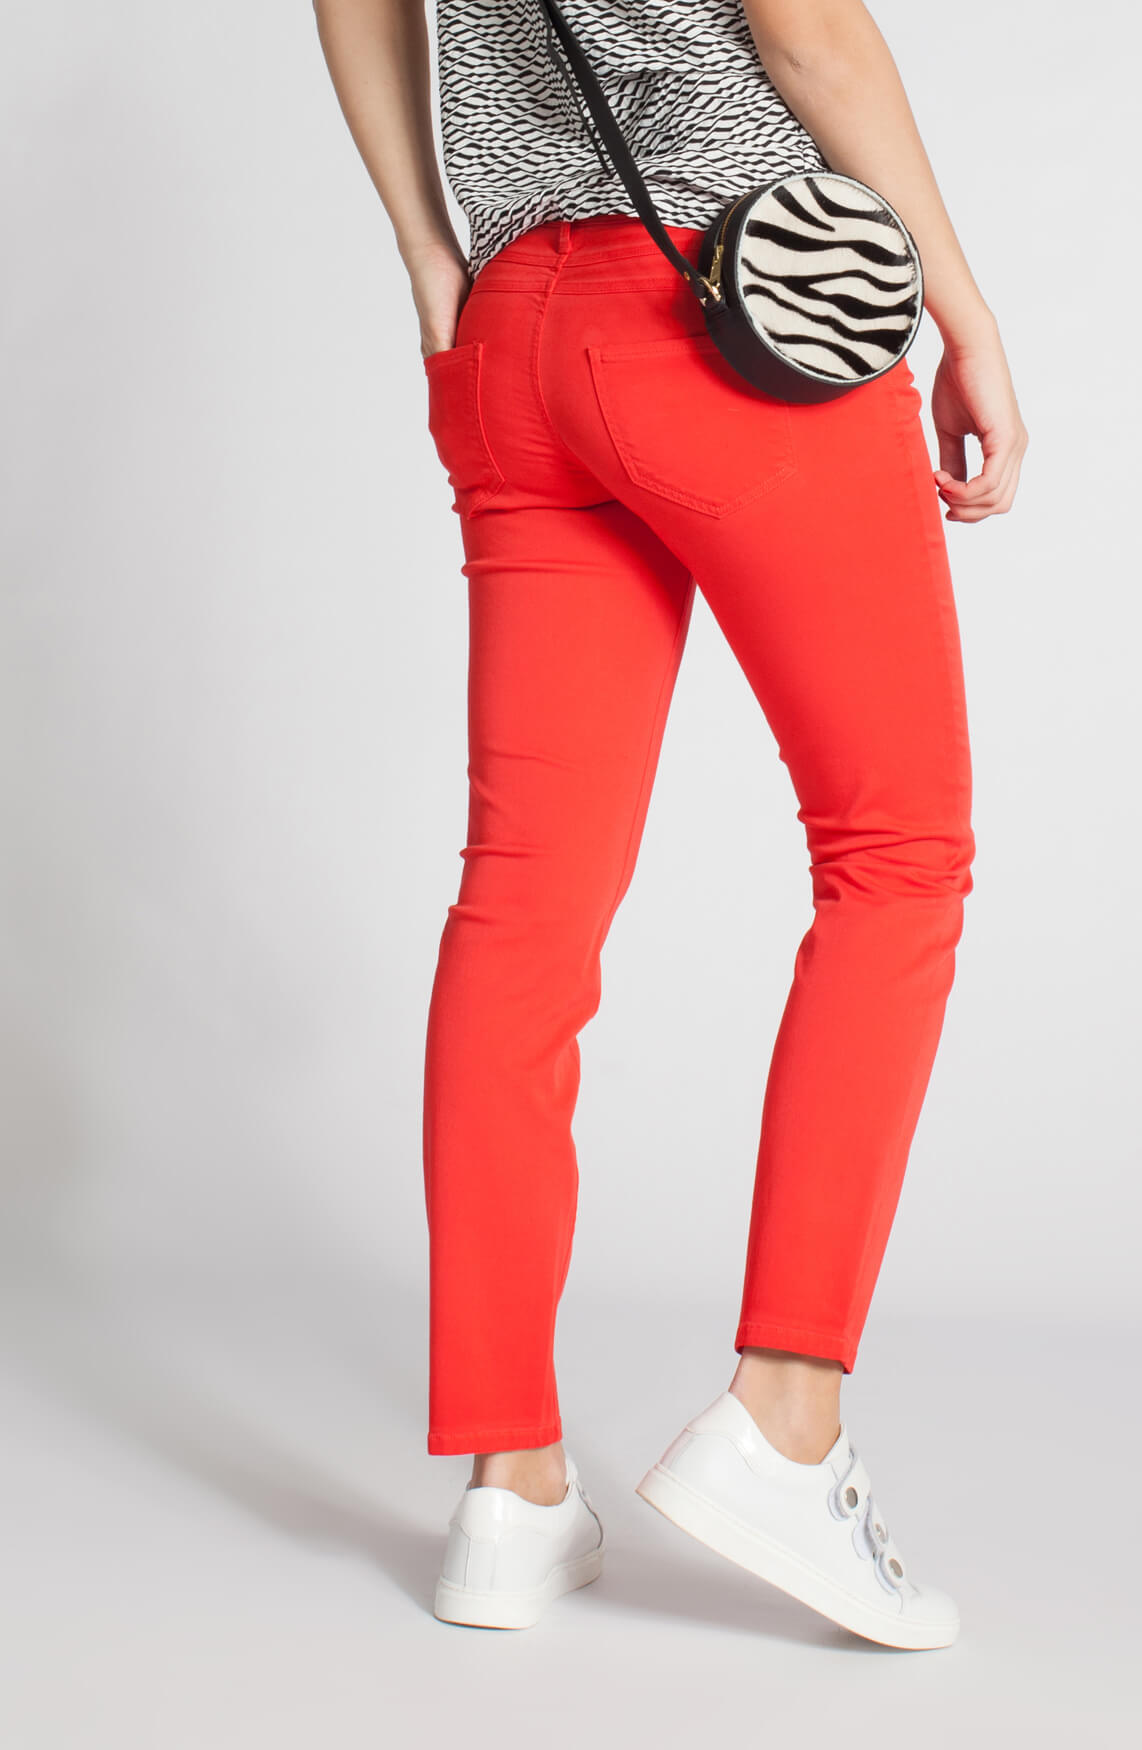 Cambio Dames Liu jeans rood 0